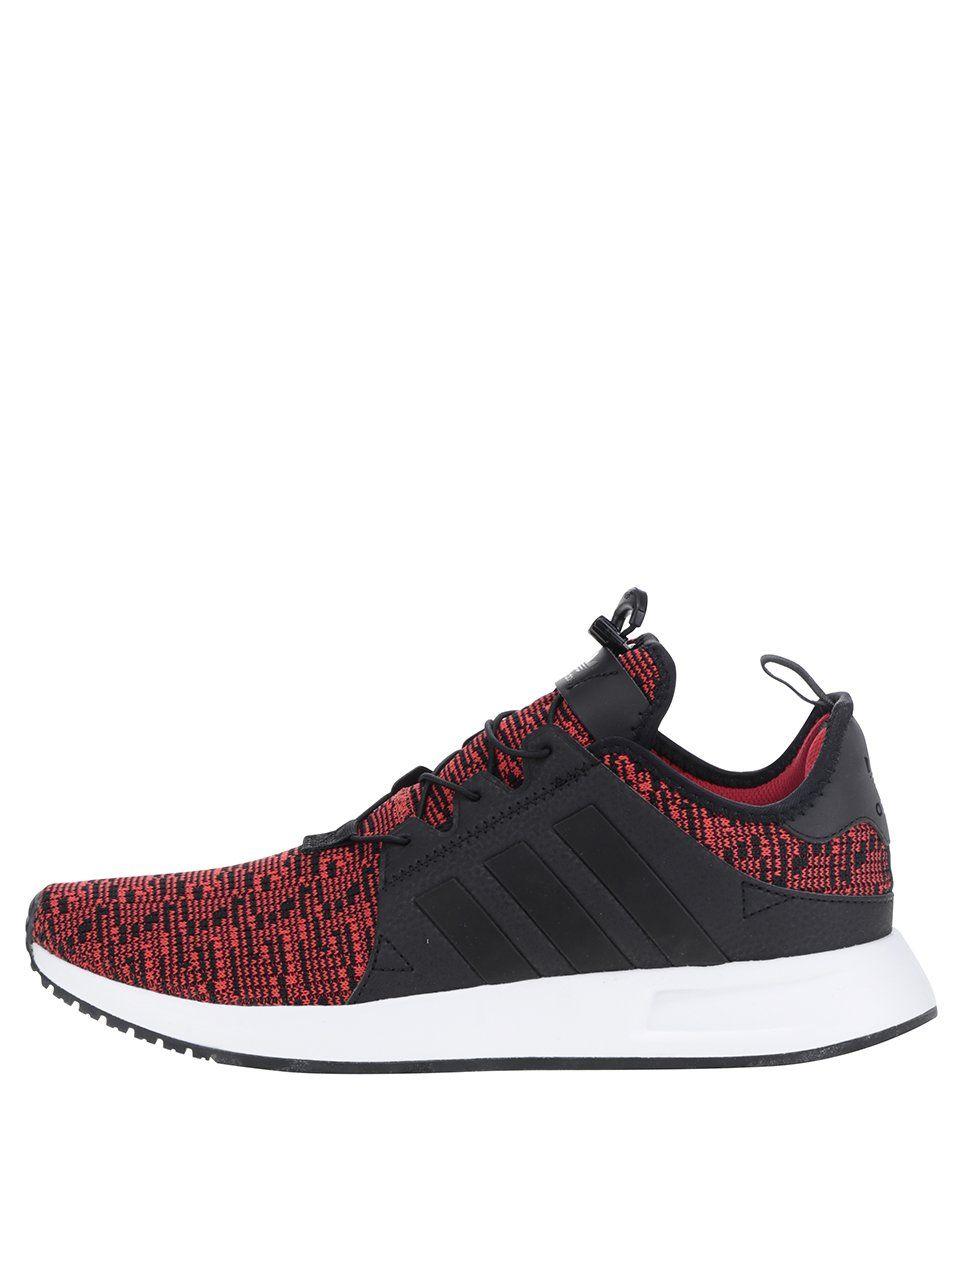 34aa38b8c02 Černo-červené žíhané pánské tenisky adidas Originals X  PLR 2699 Kč ...